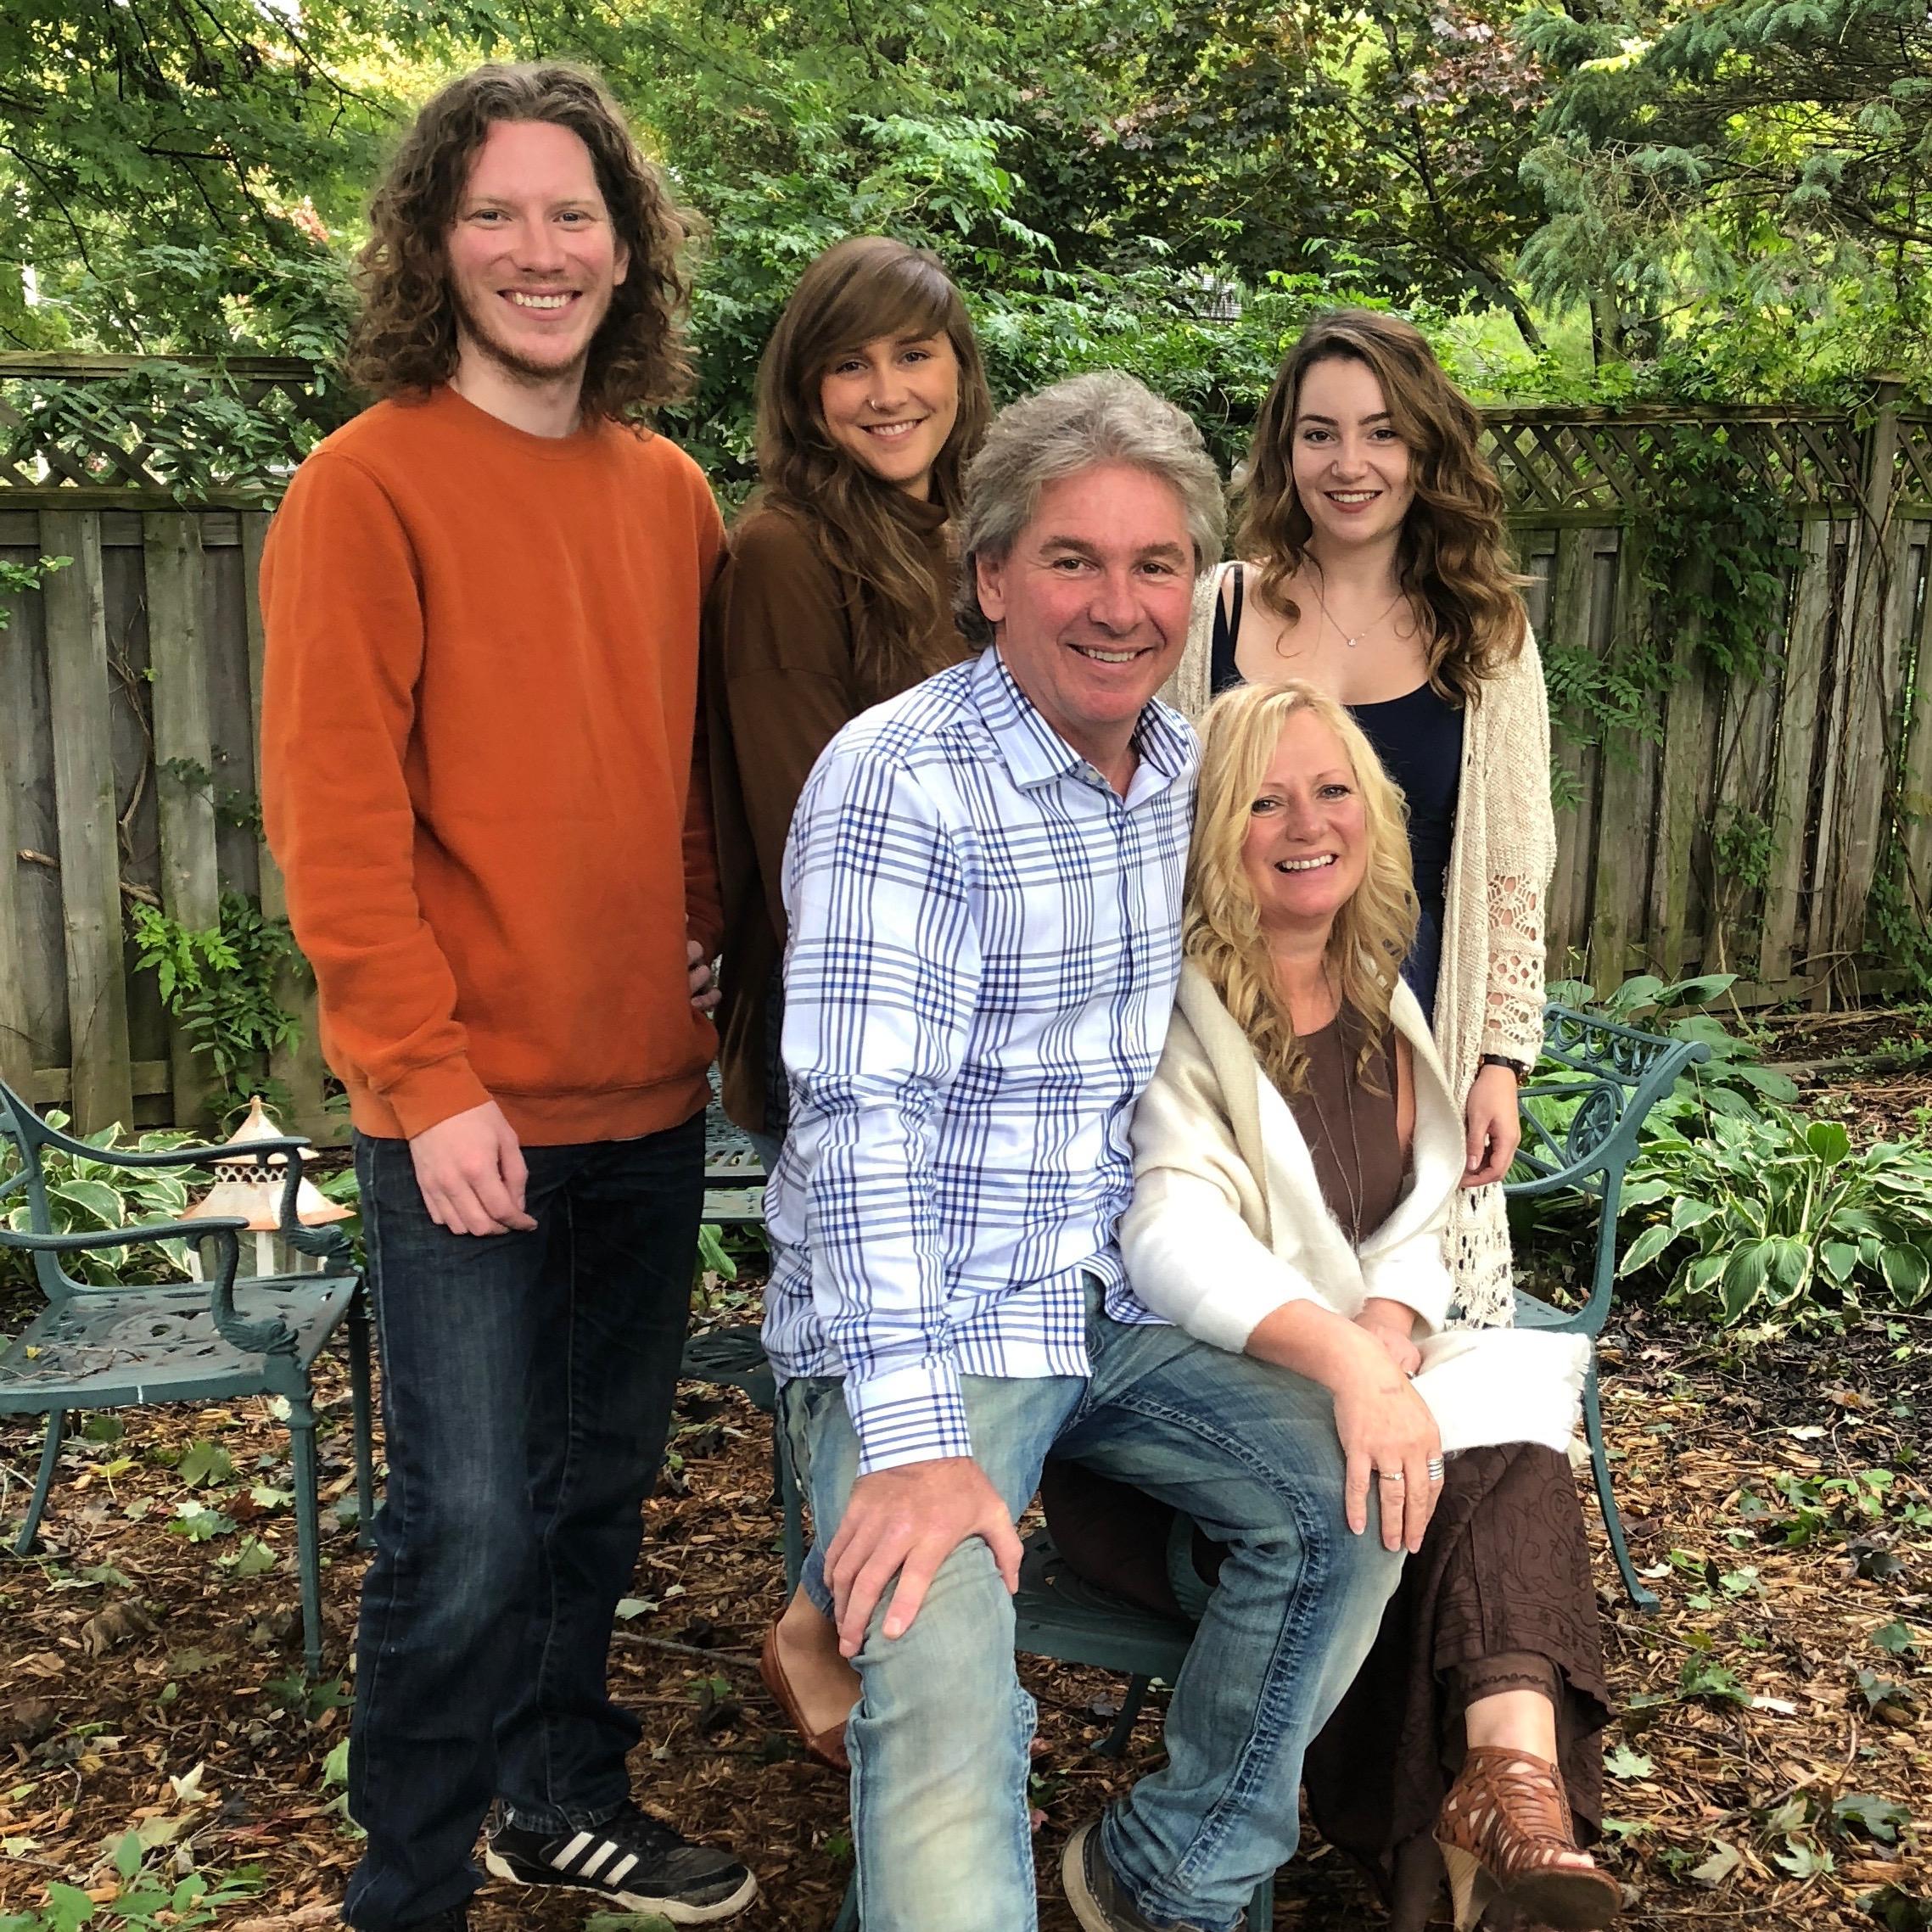 Jordan Family Photo